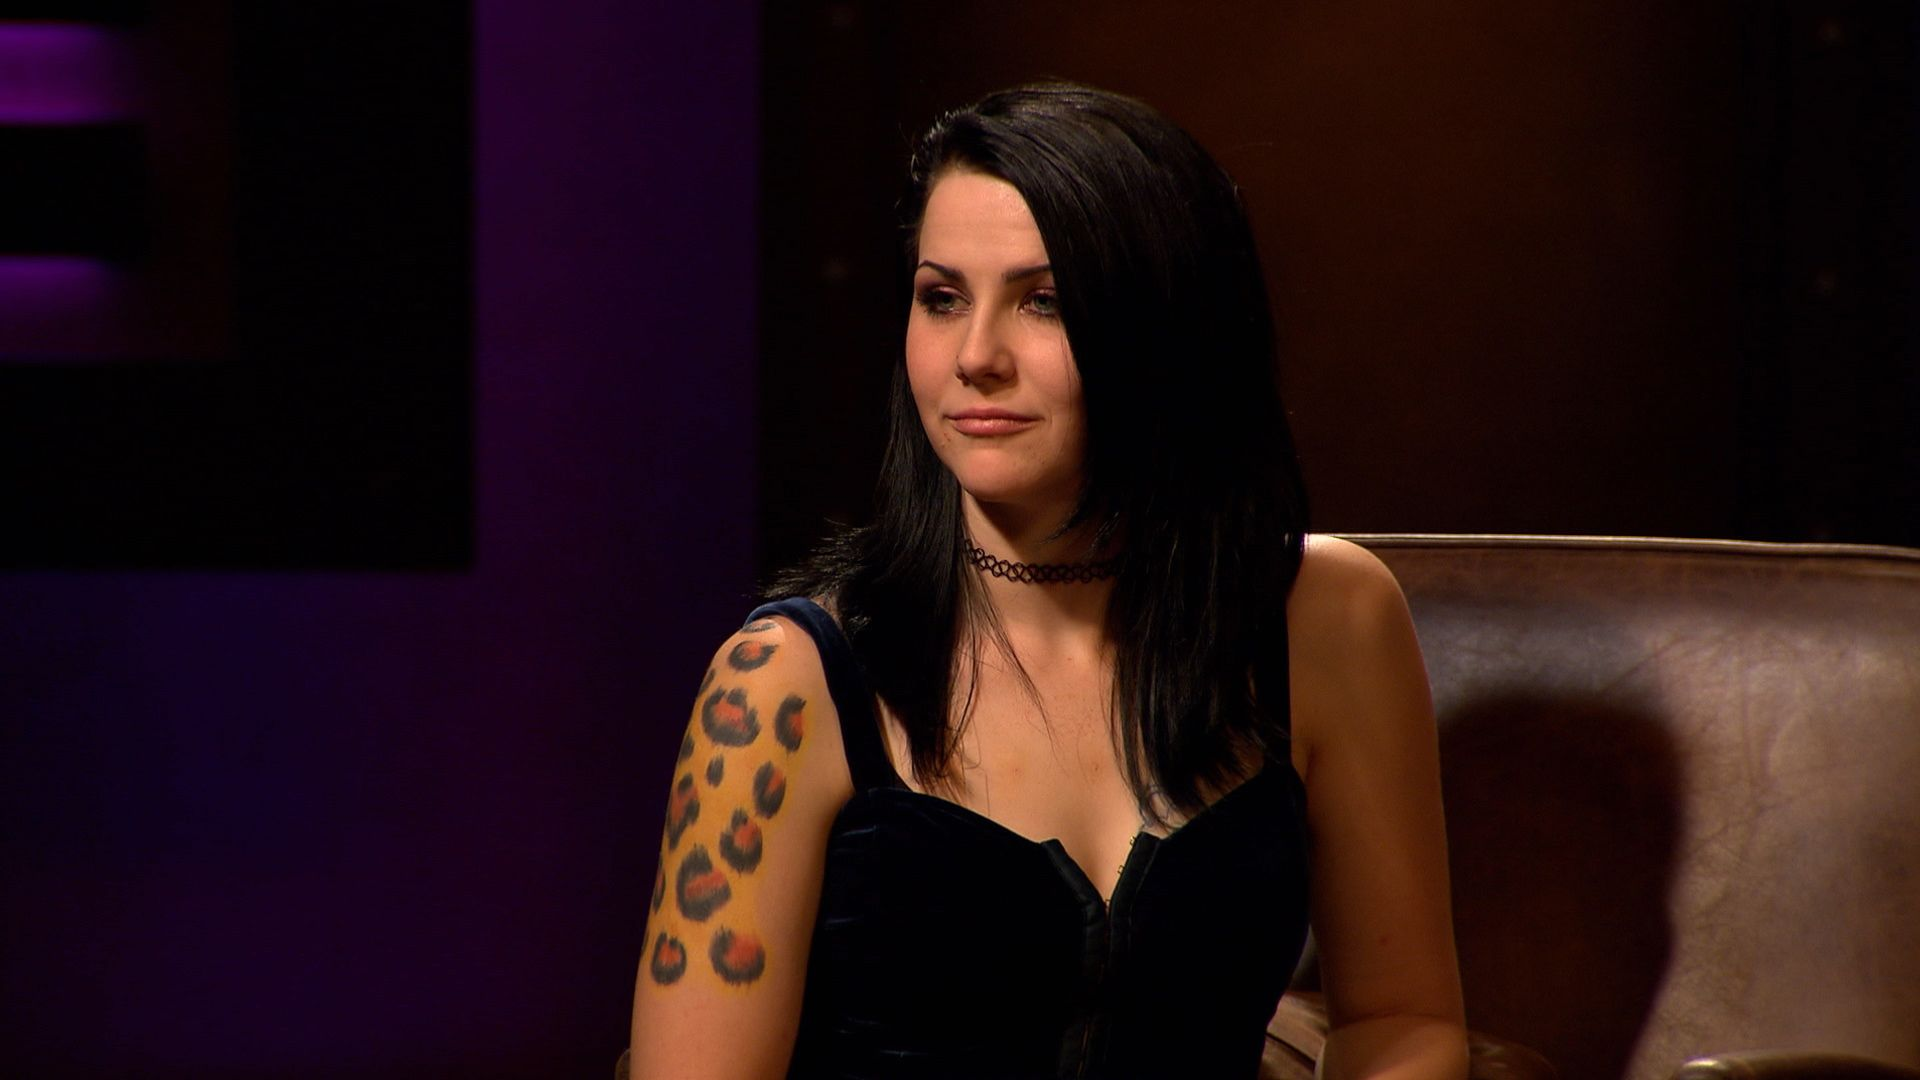 Ink master redemption season 2 ep 4 cheetah print for Tattoo girls full episodes